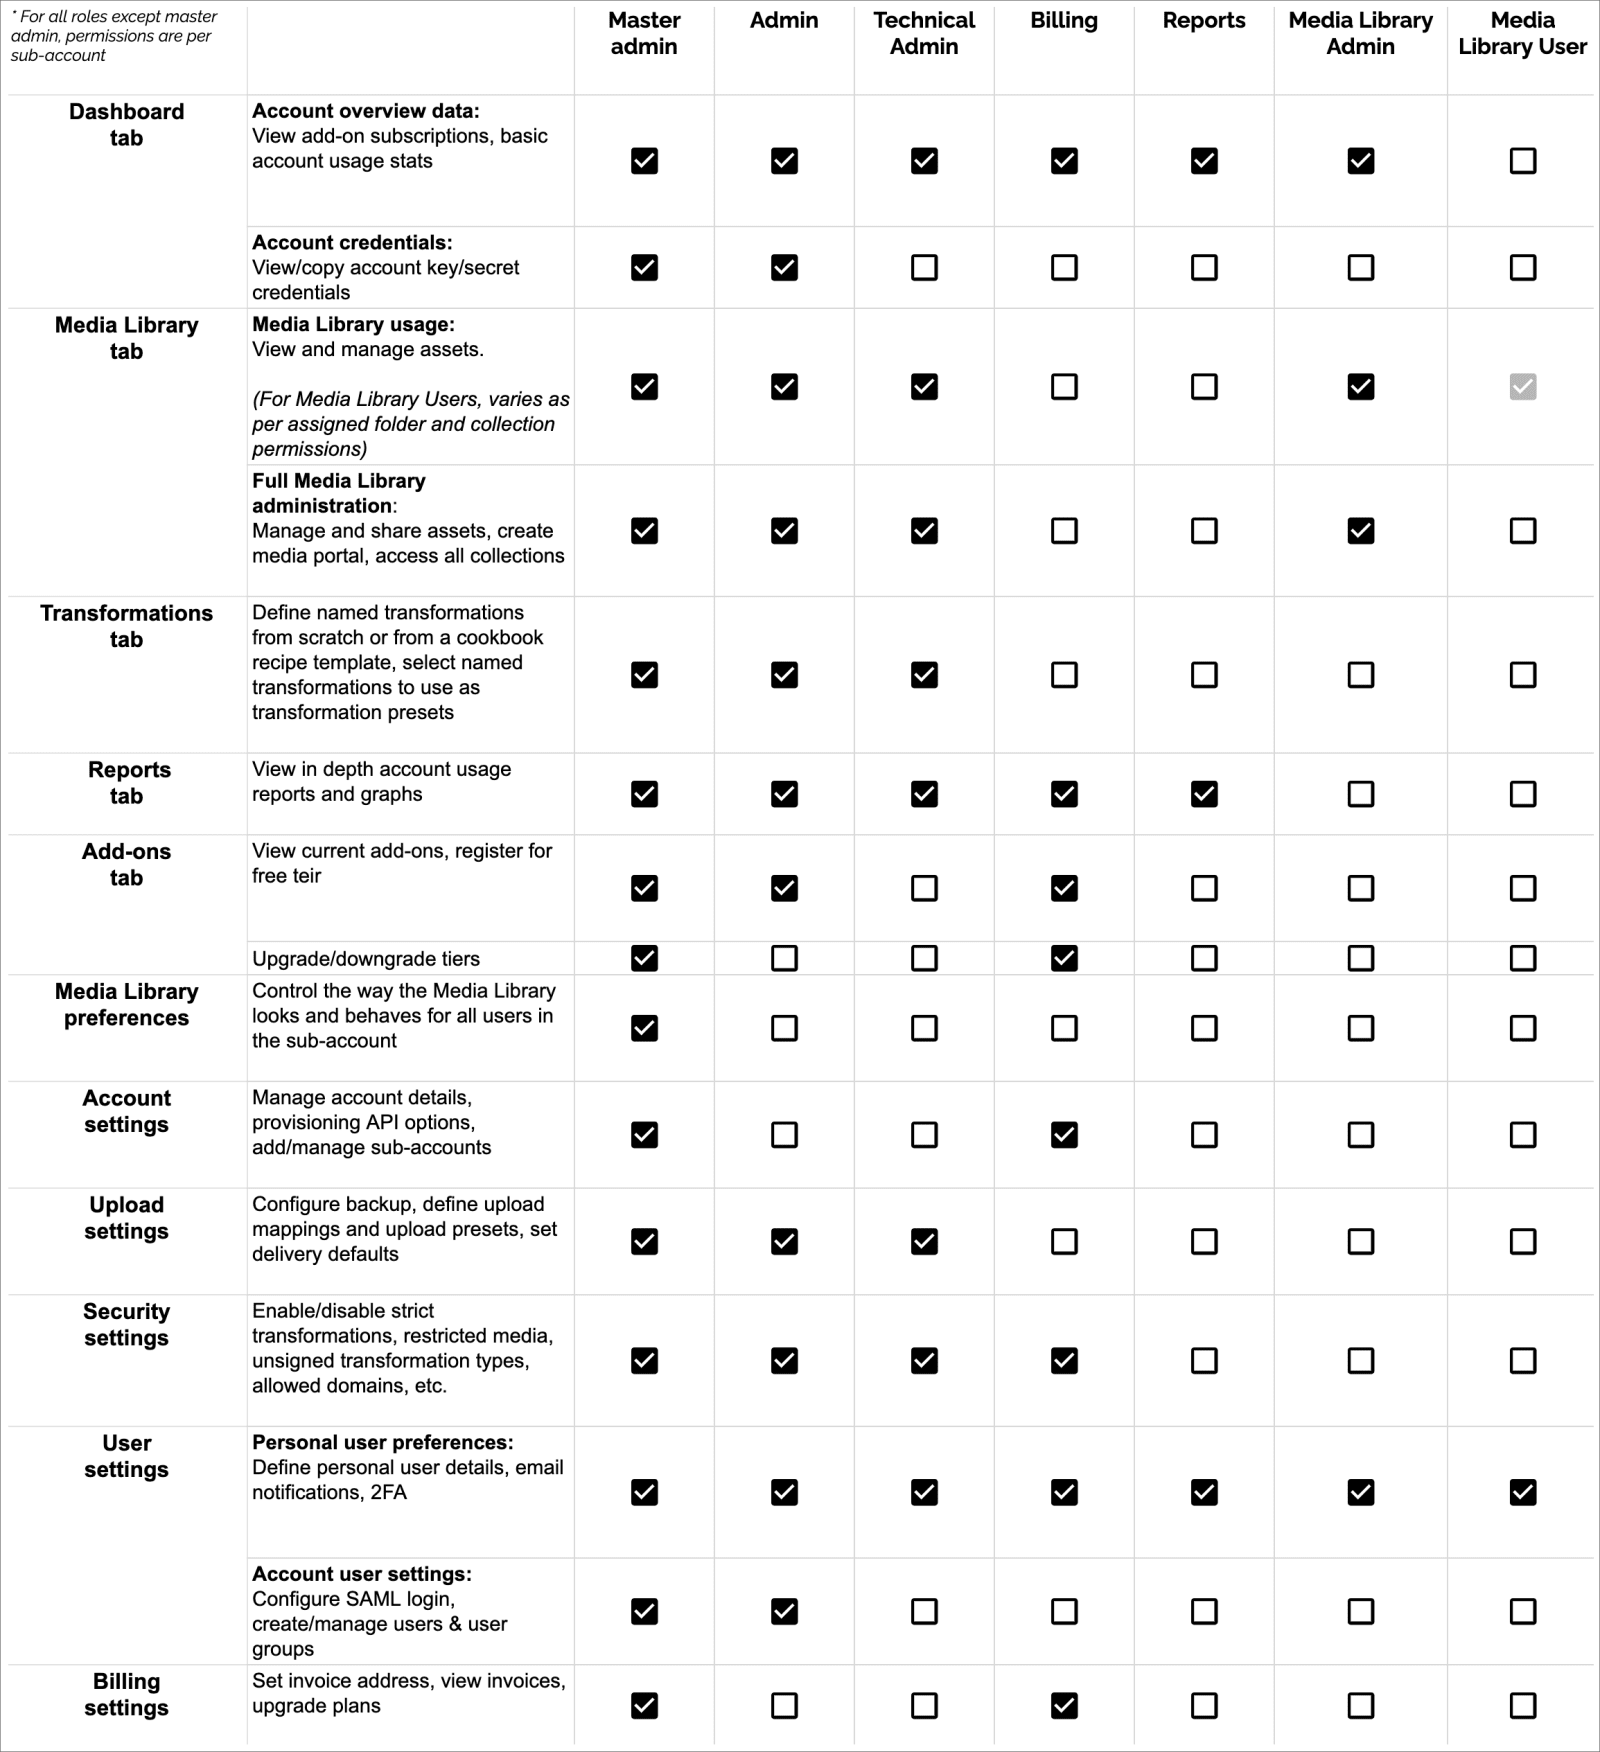 Table summarizing all role-based permissions